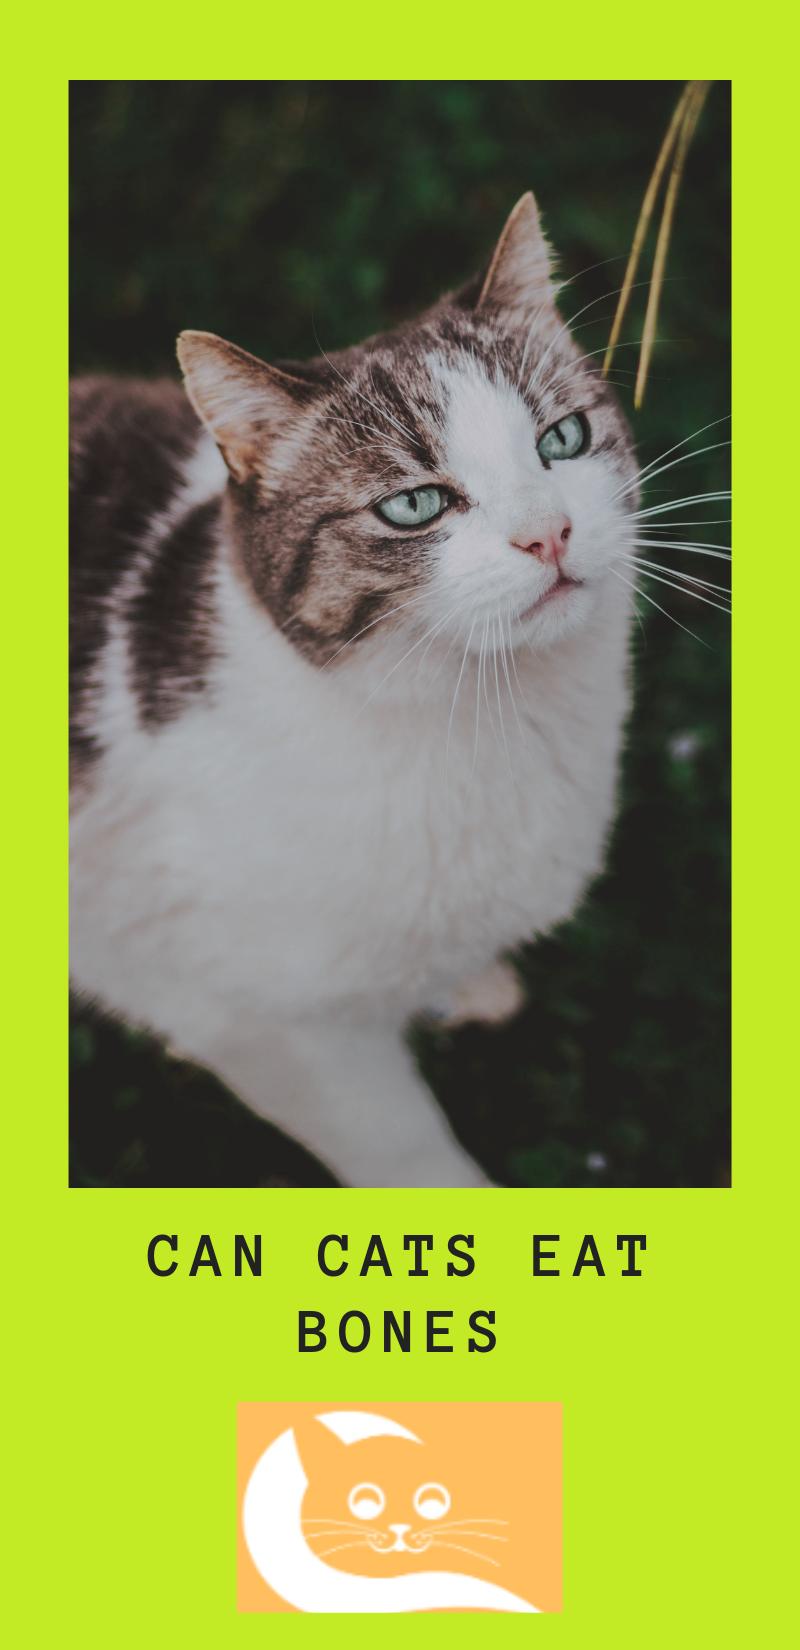 Can Cats Eat Bones Cats, Cat diet, Dog love